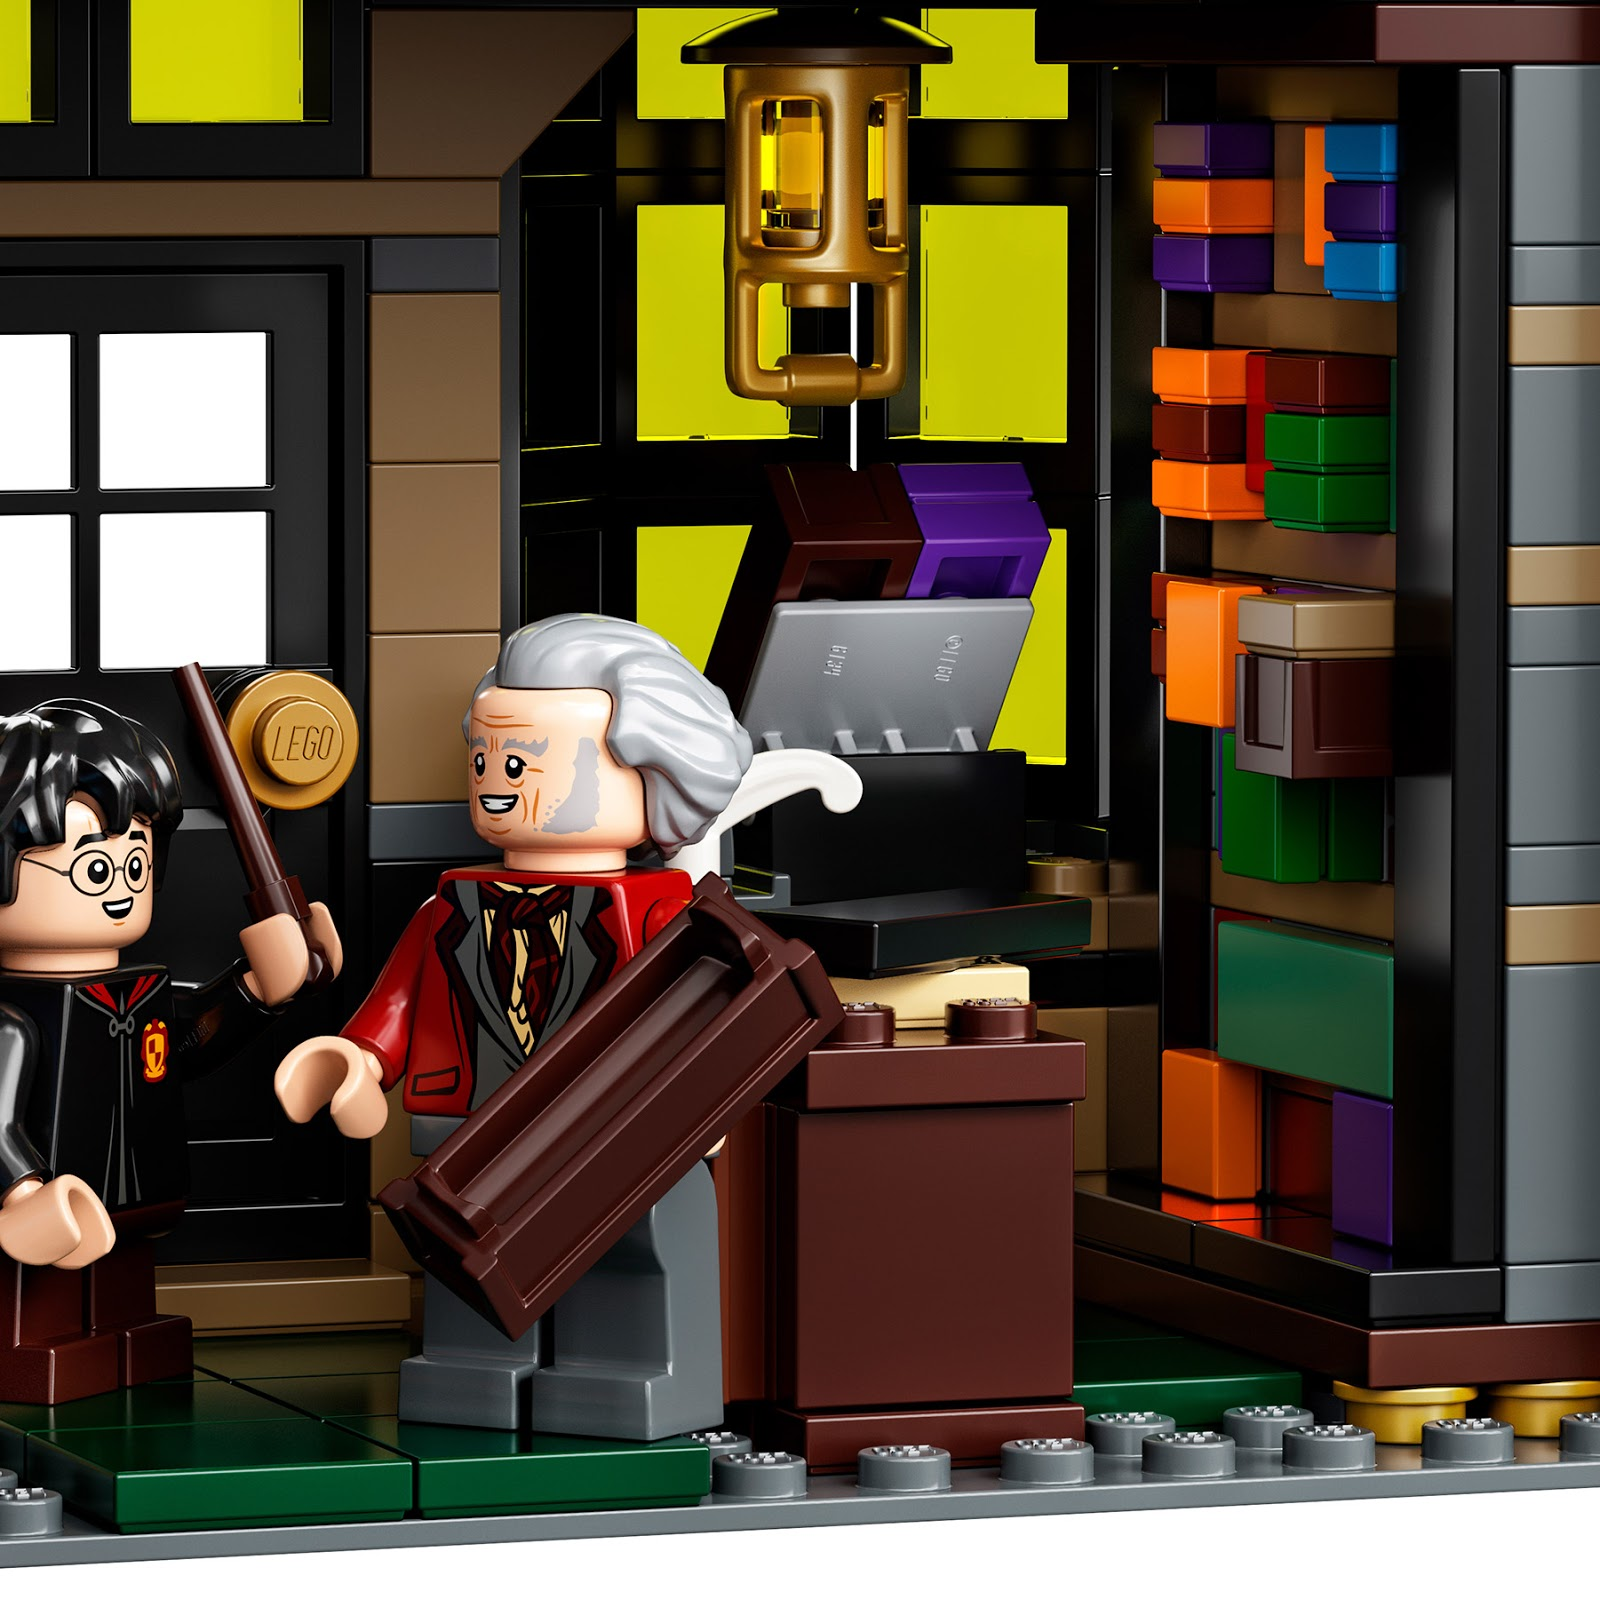 1 X LEGO Harry Potter Plate Gryffindor Red Dark Tile 2x2 Gryffindor New